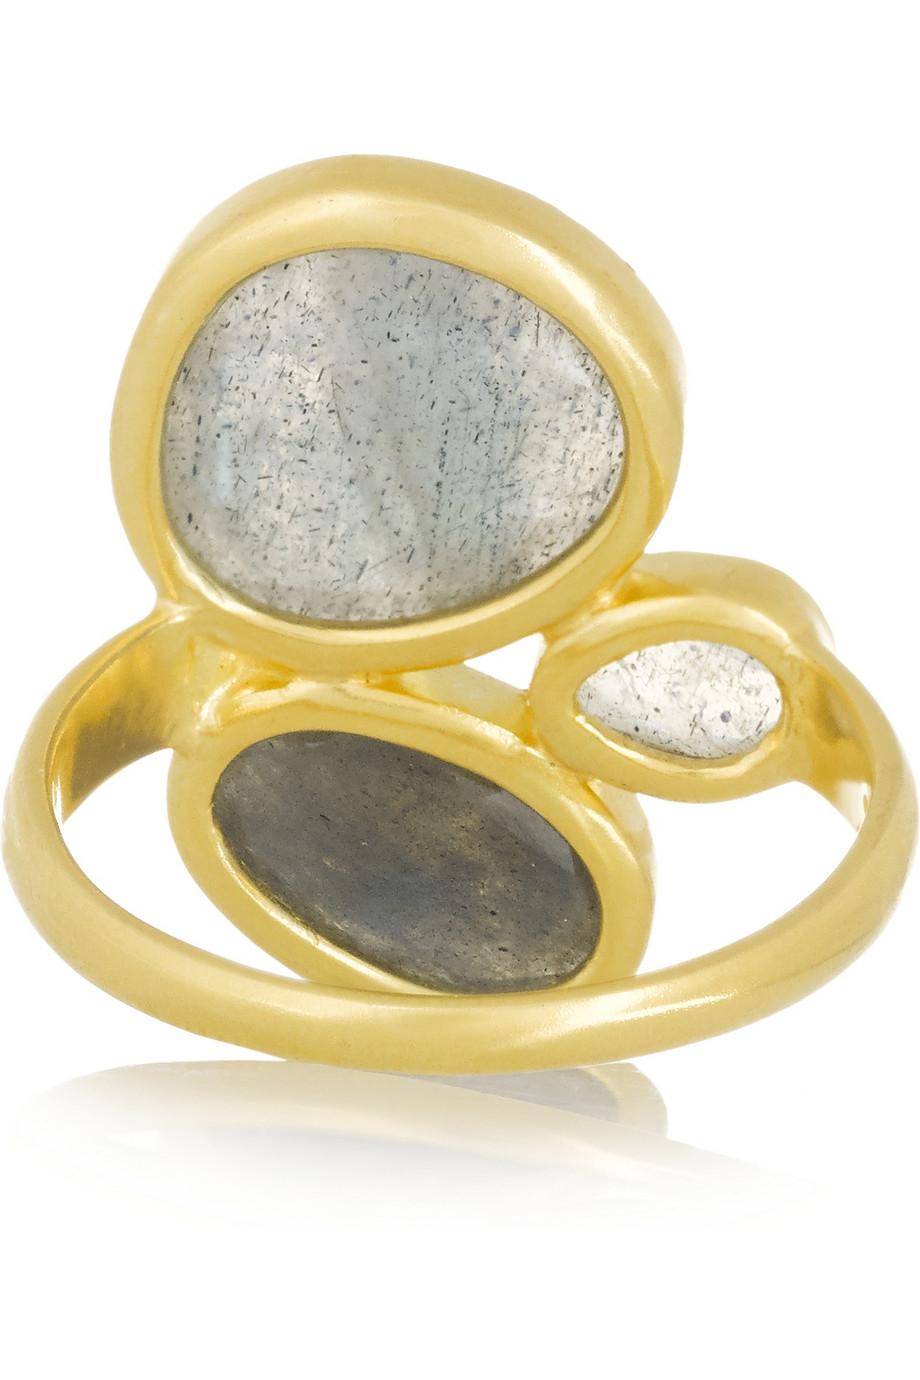 Pippa Small 18-karat Gold Labradorite Ring kq1nc